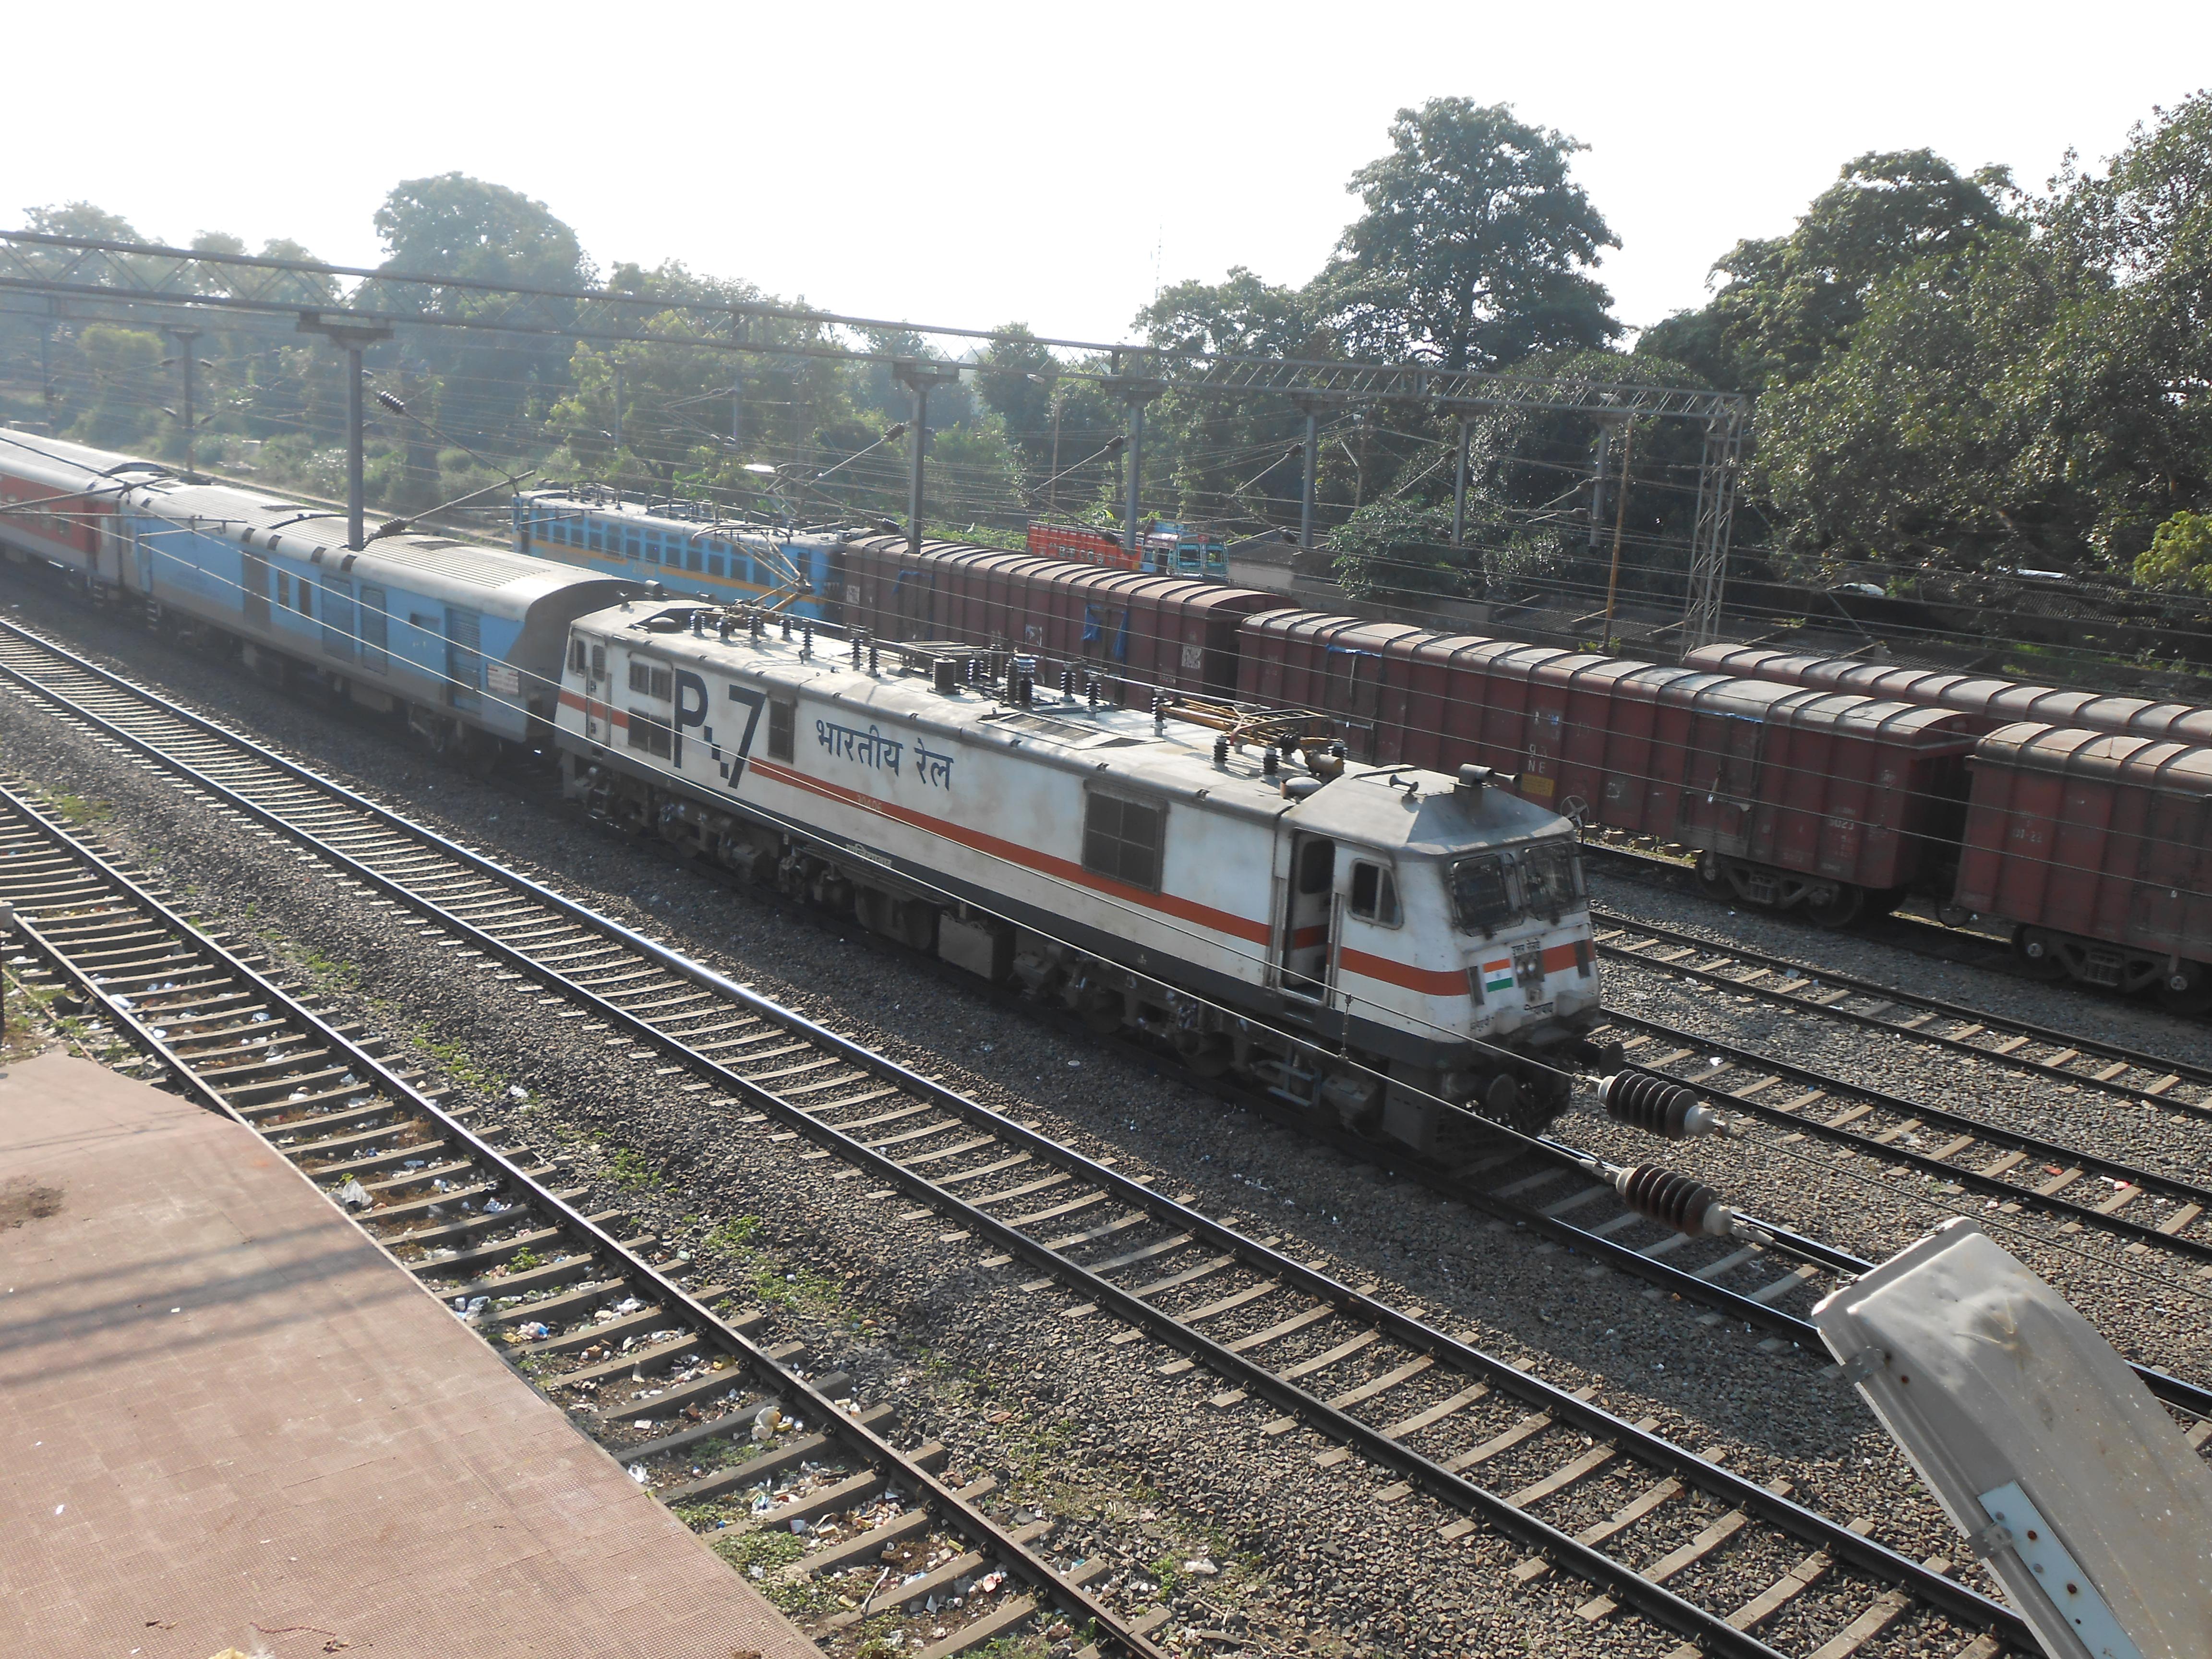 Indian Locomotive Class Wap 7 Wikipedia My House Has A Generator Transfer Switch Protran 30310b Attached To Ghaziabad Based Head On Generation Hog Hauling Bhubaneswar Rajdhani Express At Balasore Odisha